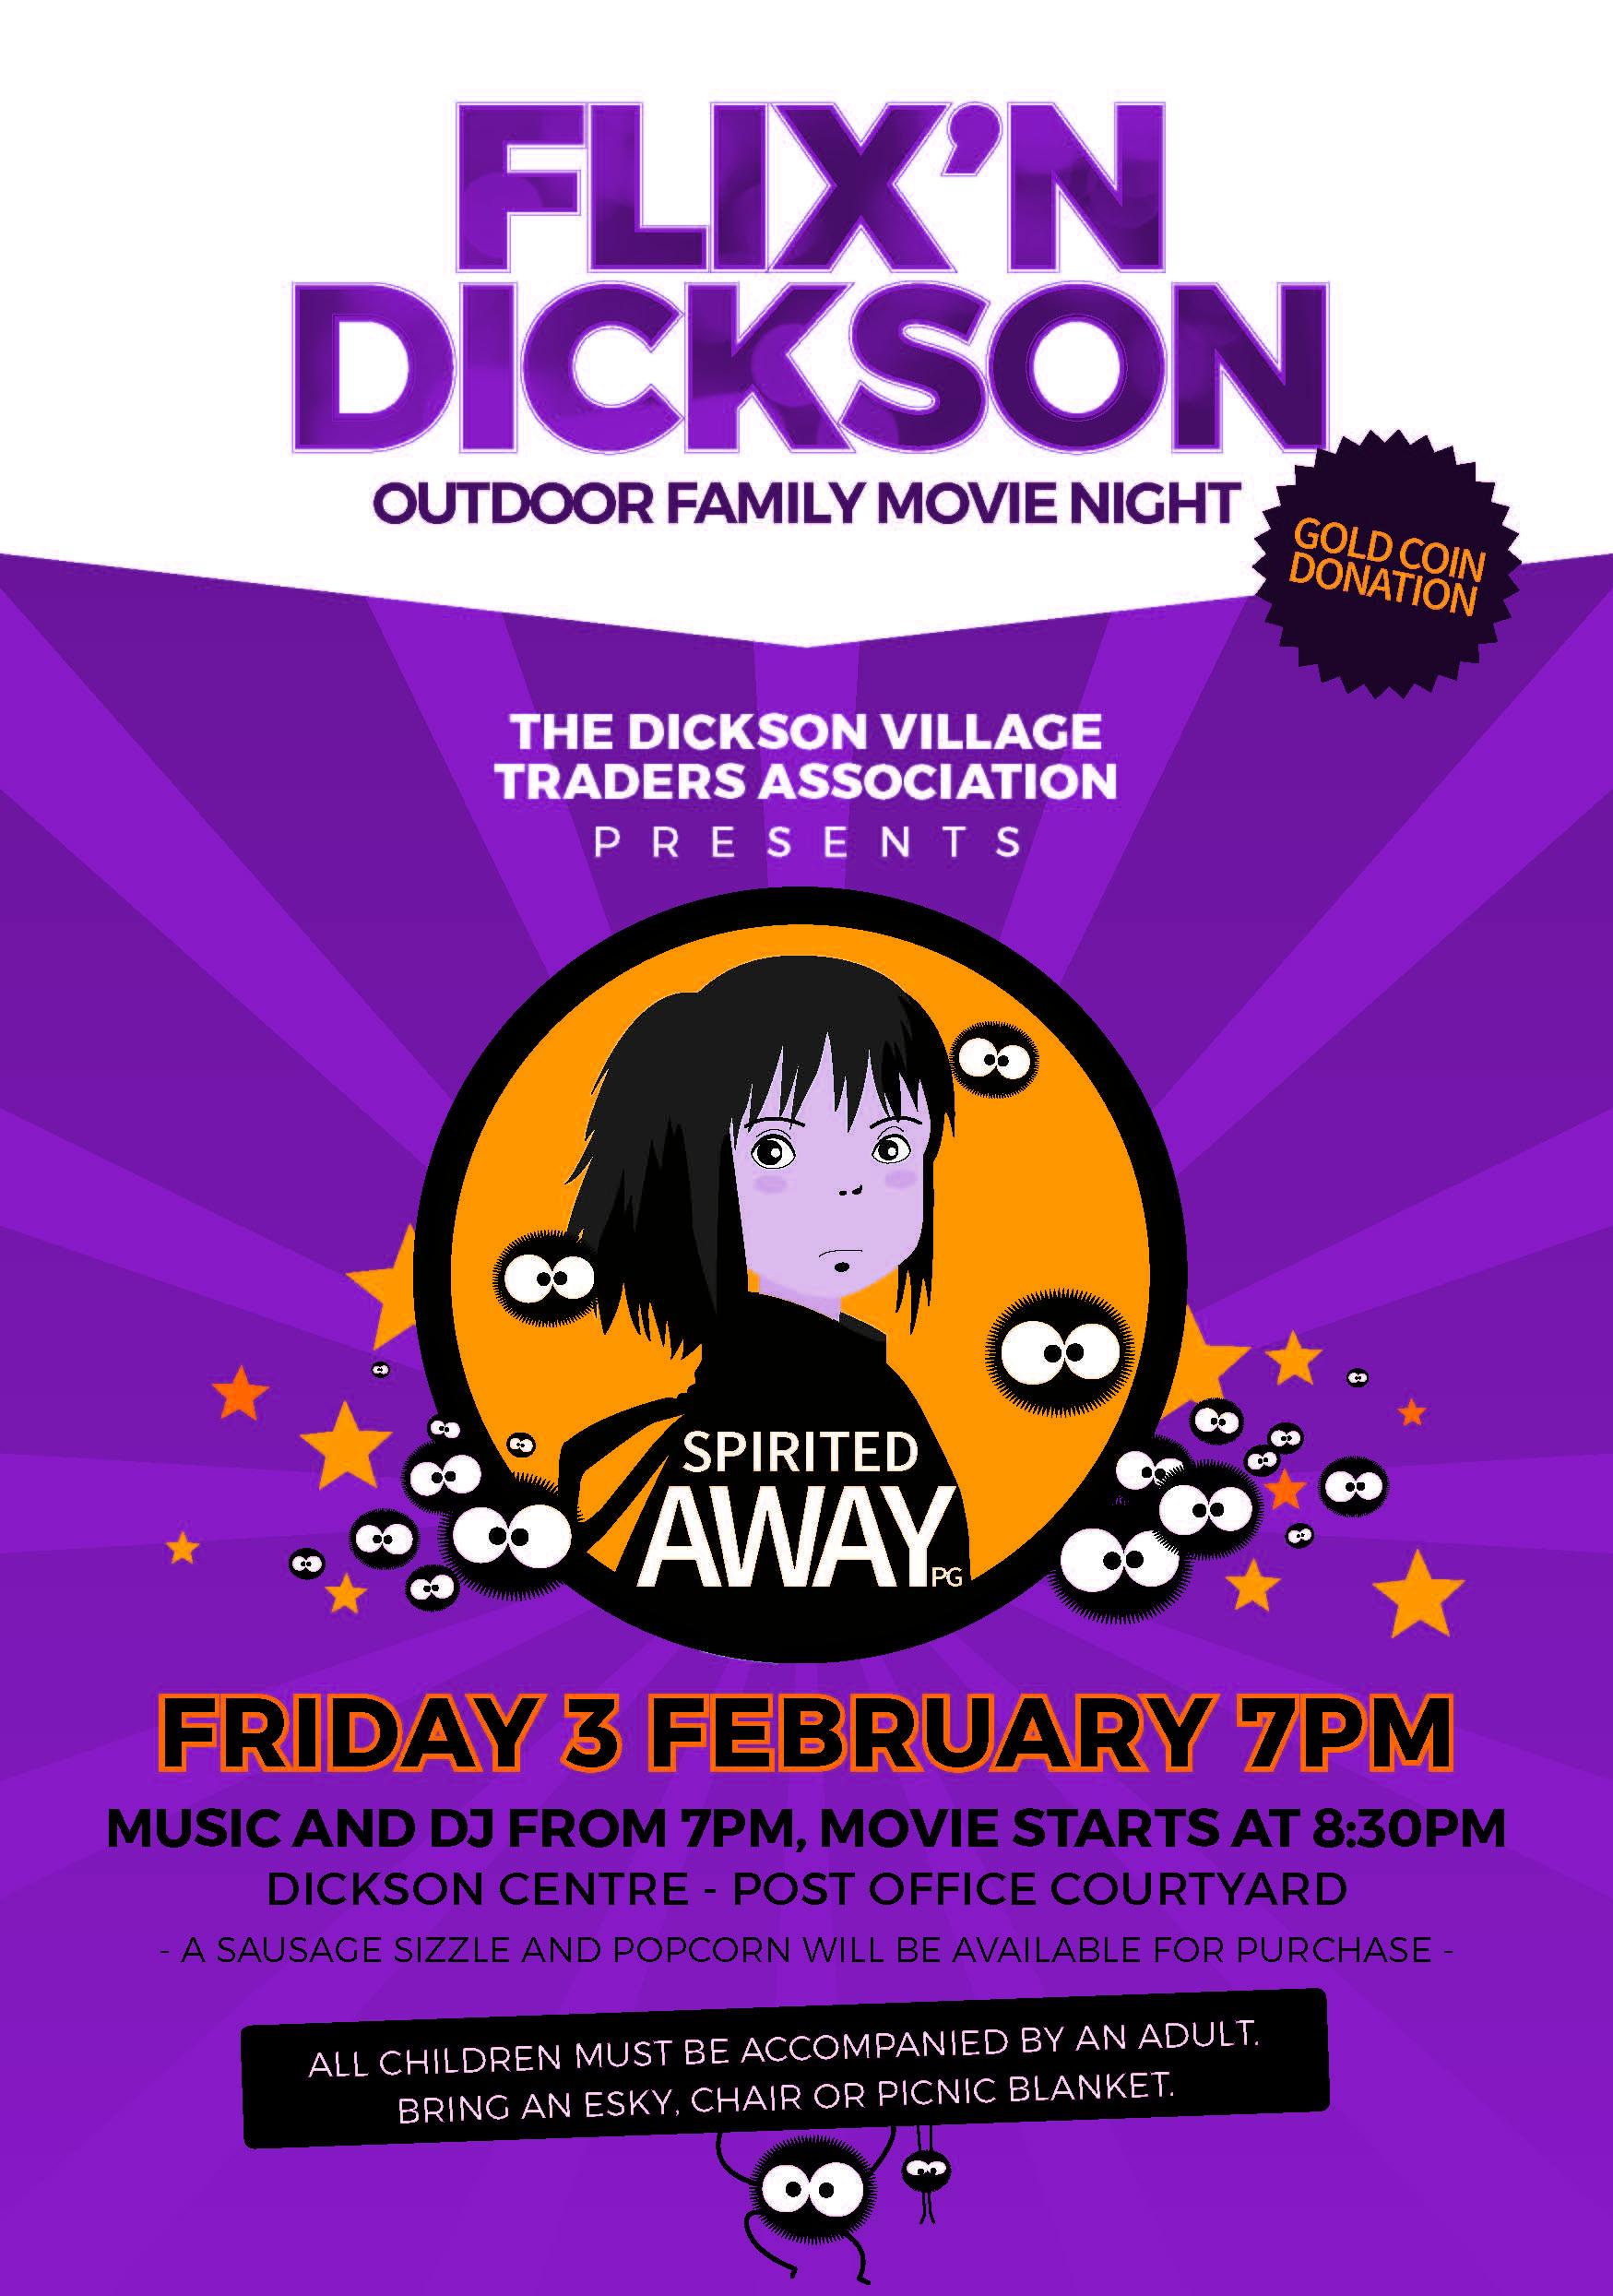 Flix'n Dickson Outdoor Family Disco & Movie night, Friday 3 February